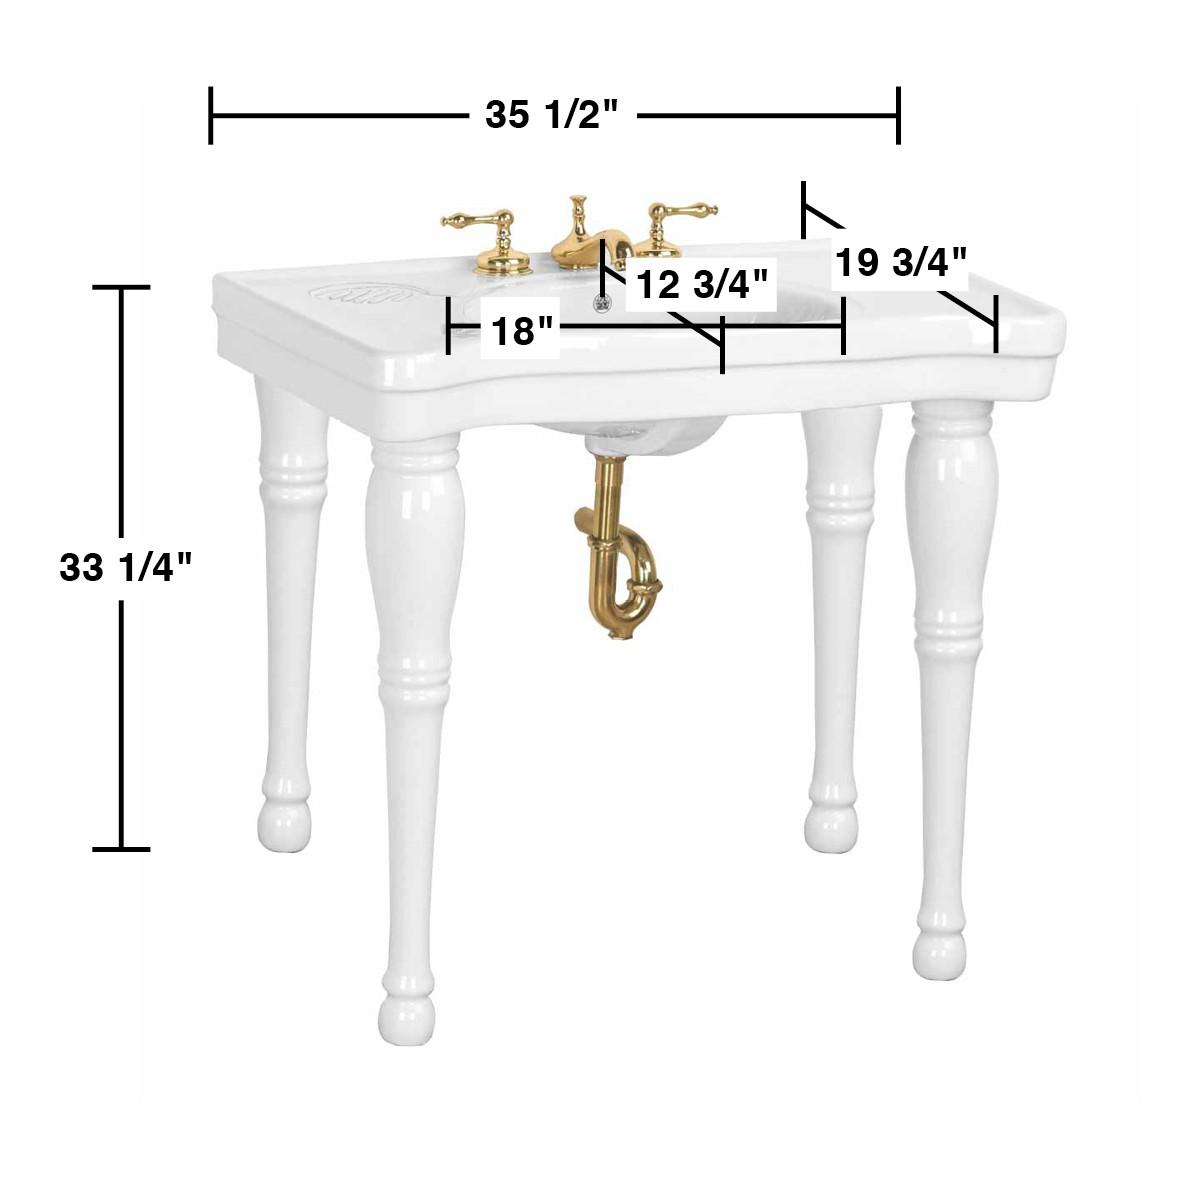 Elegant Spec U003cPREu003eConsole Sink White Belle Epoque Spindle Leg Widespread U003c/PRE